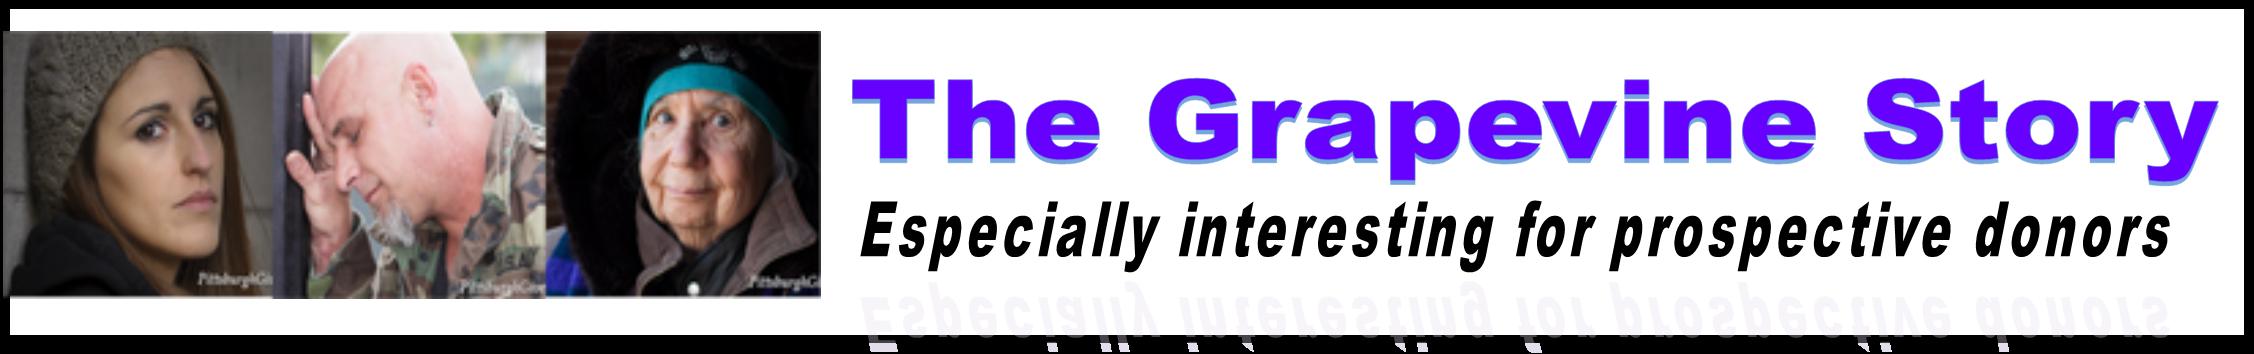 Video GV Story